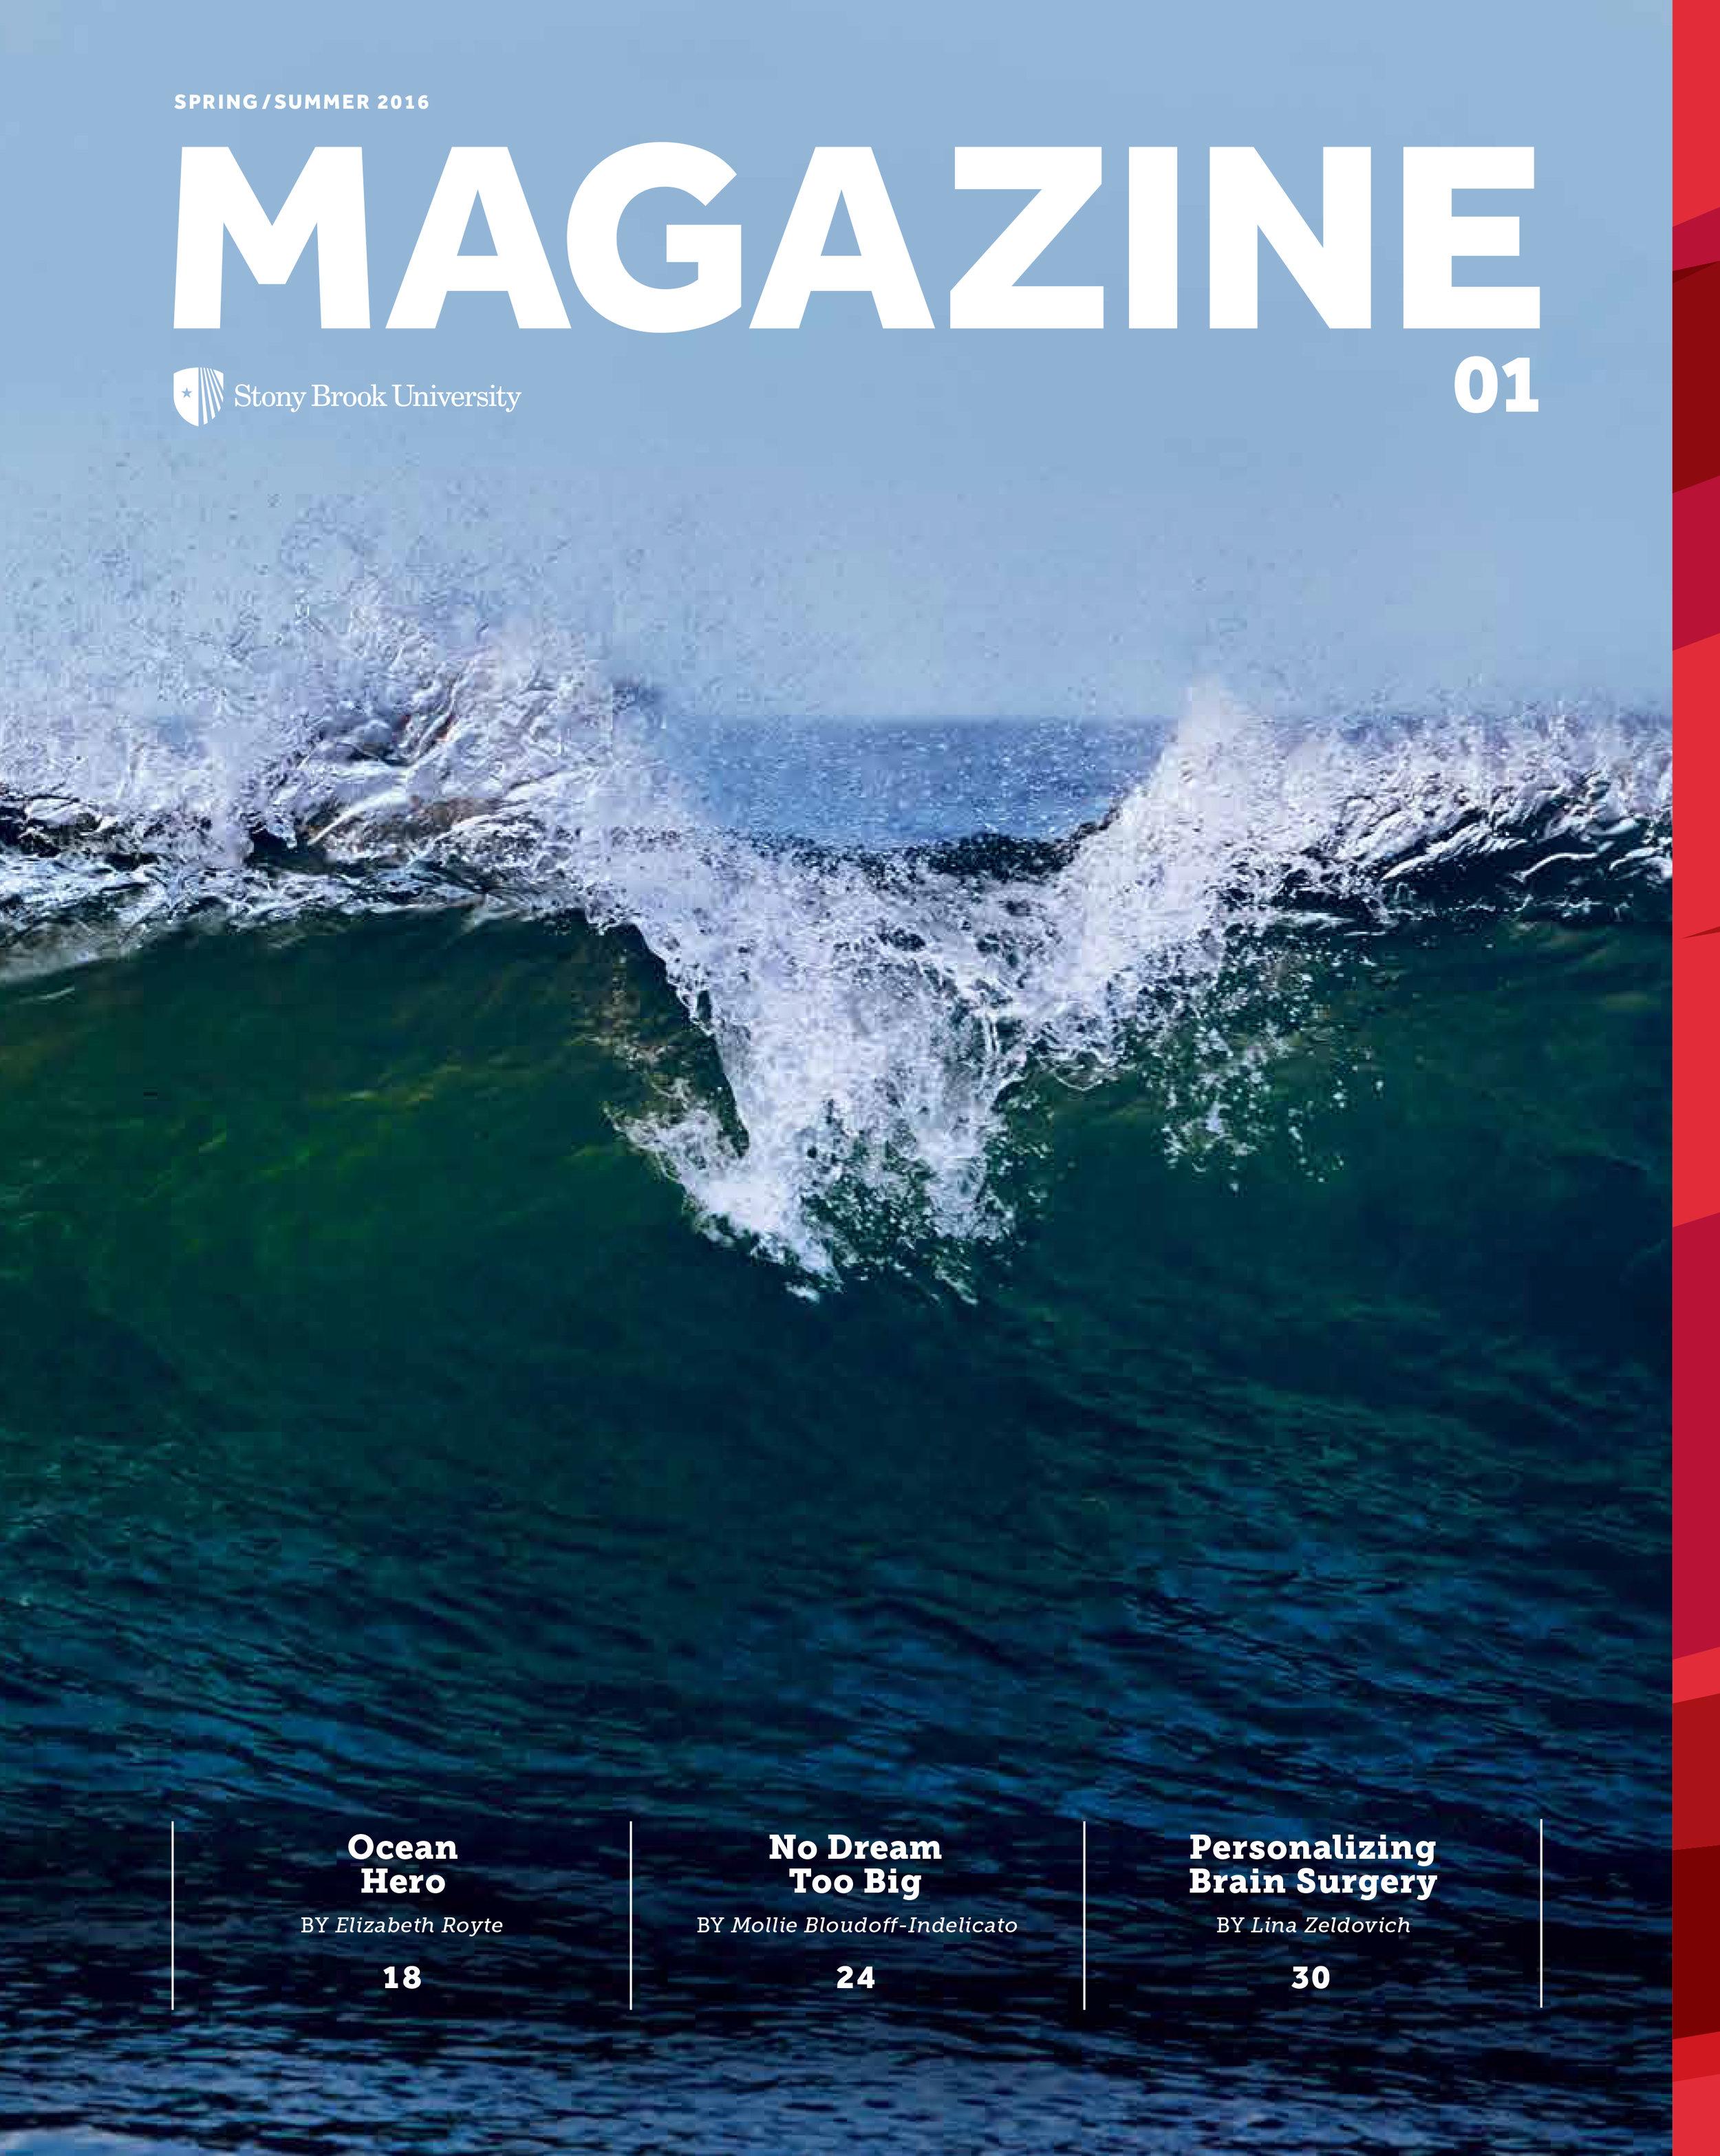 SBU_Magazine_Issue01_Final-1.jpg